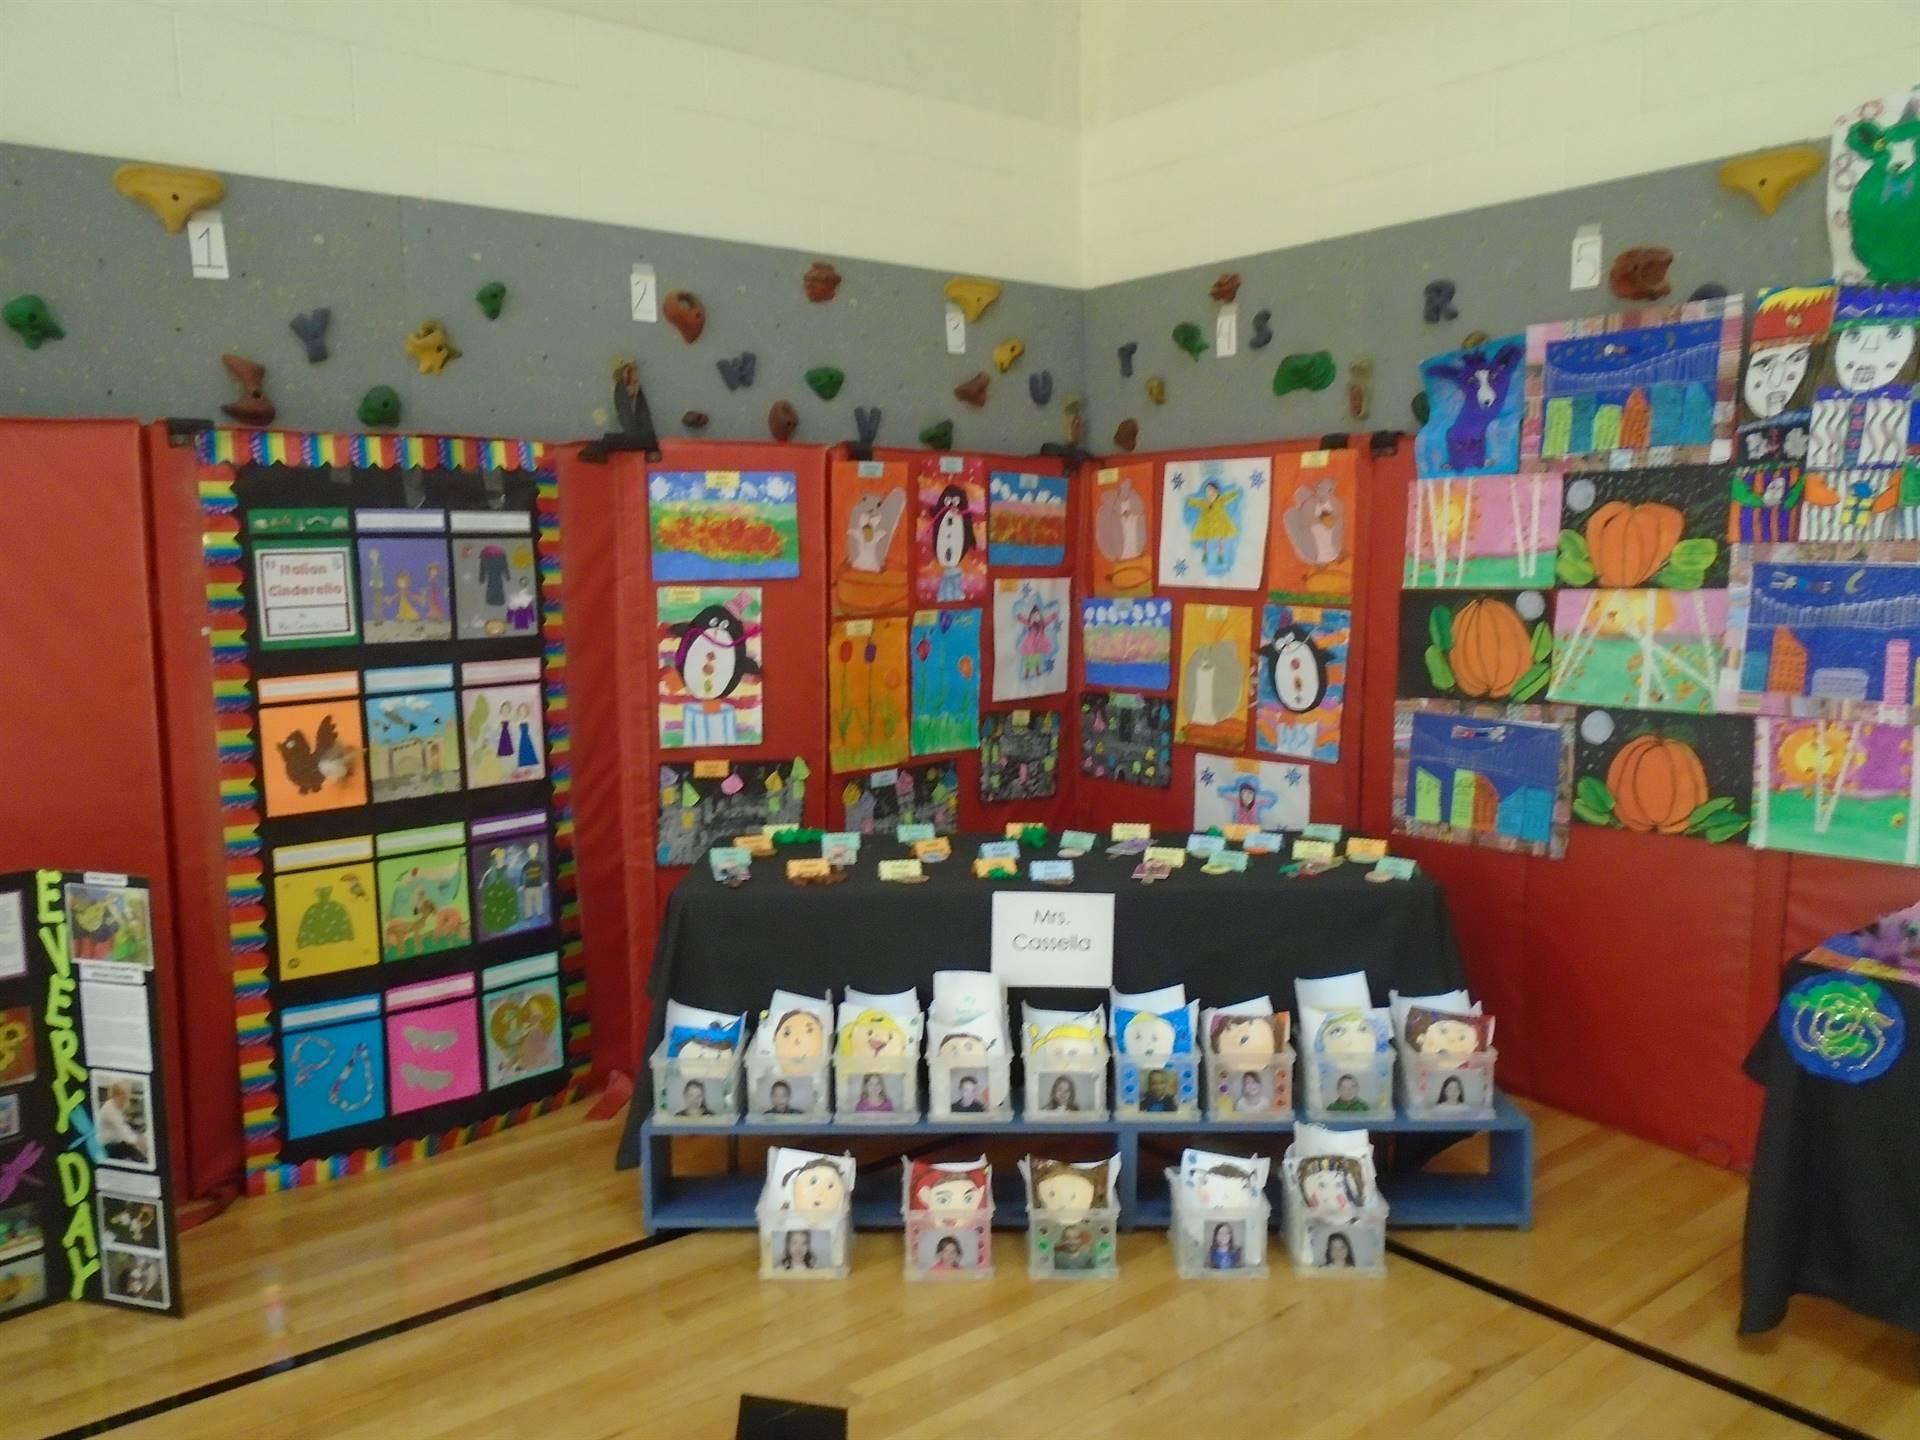 Student Art ExhibitStudent Art Exhibit